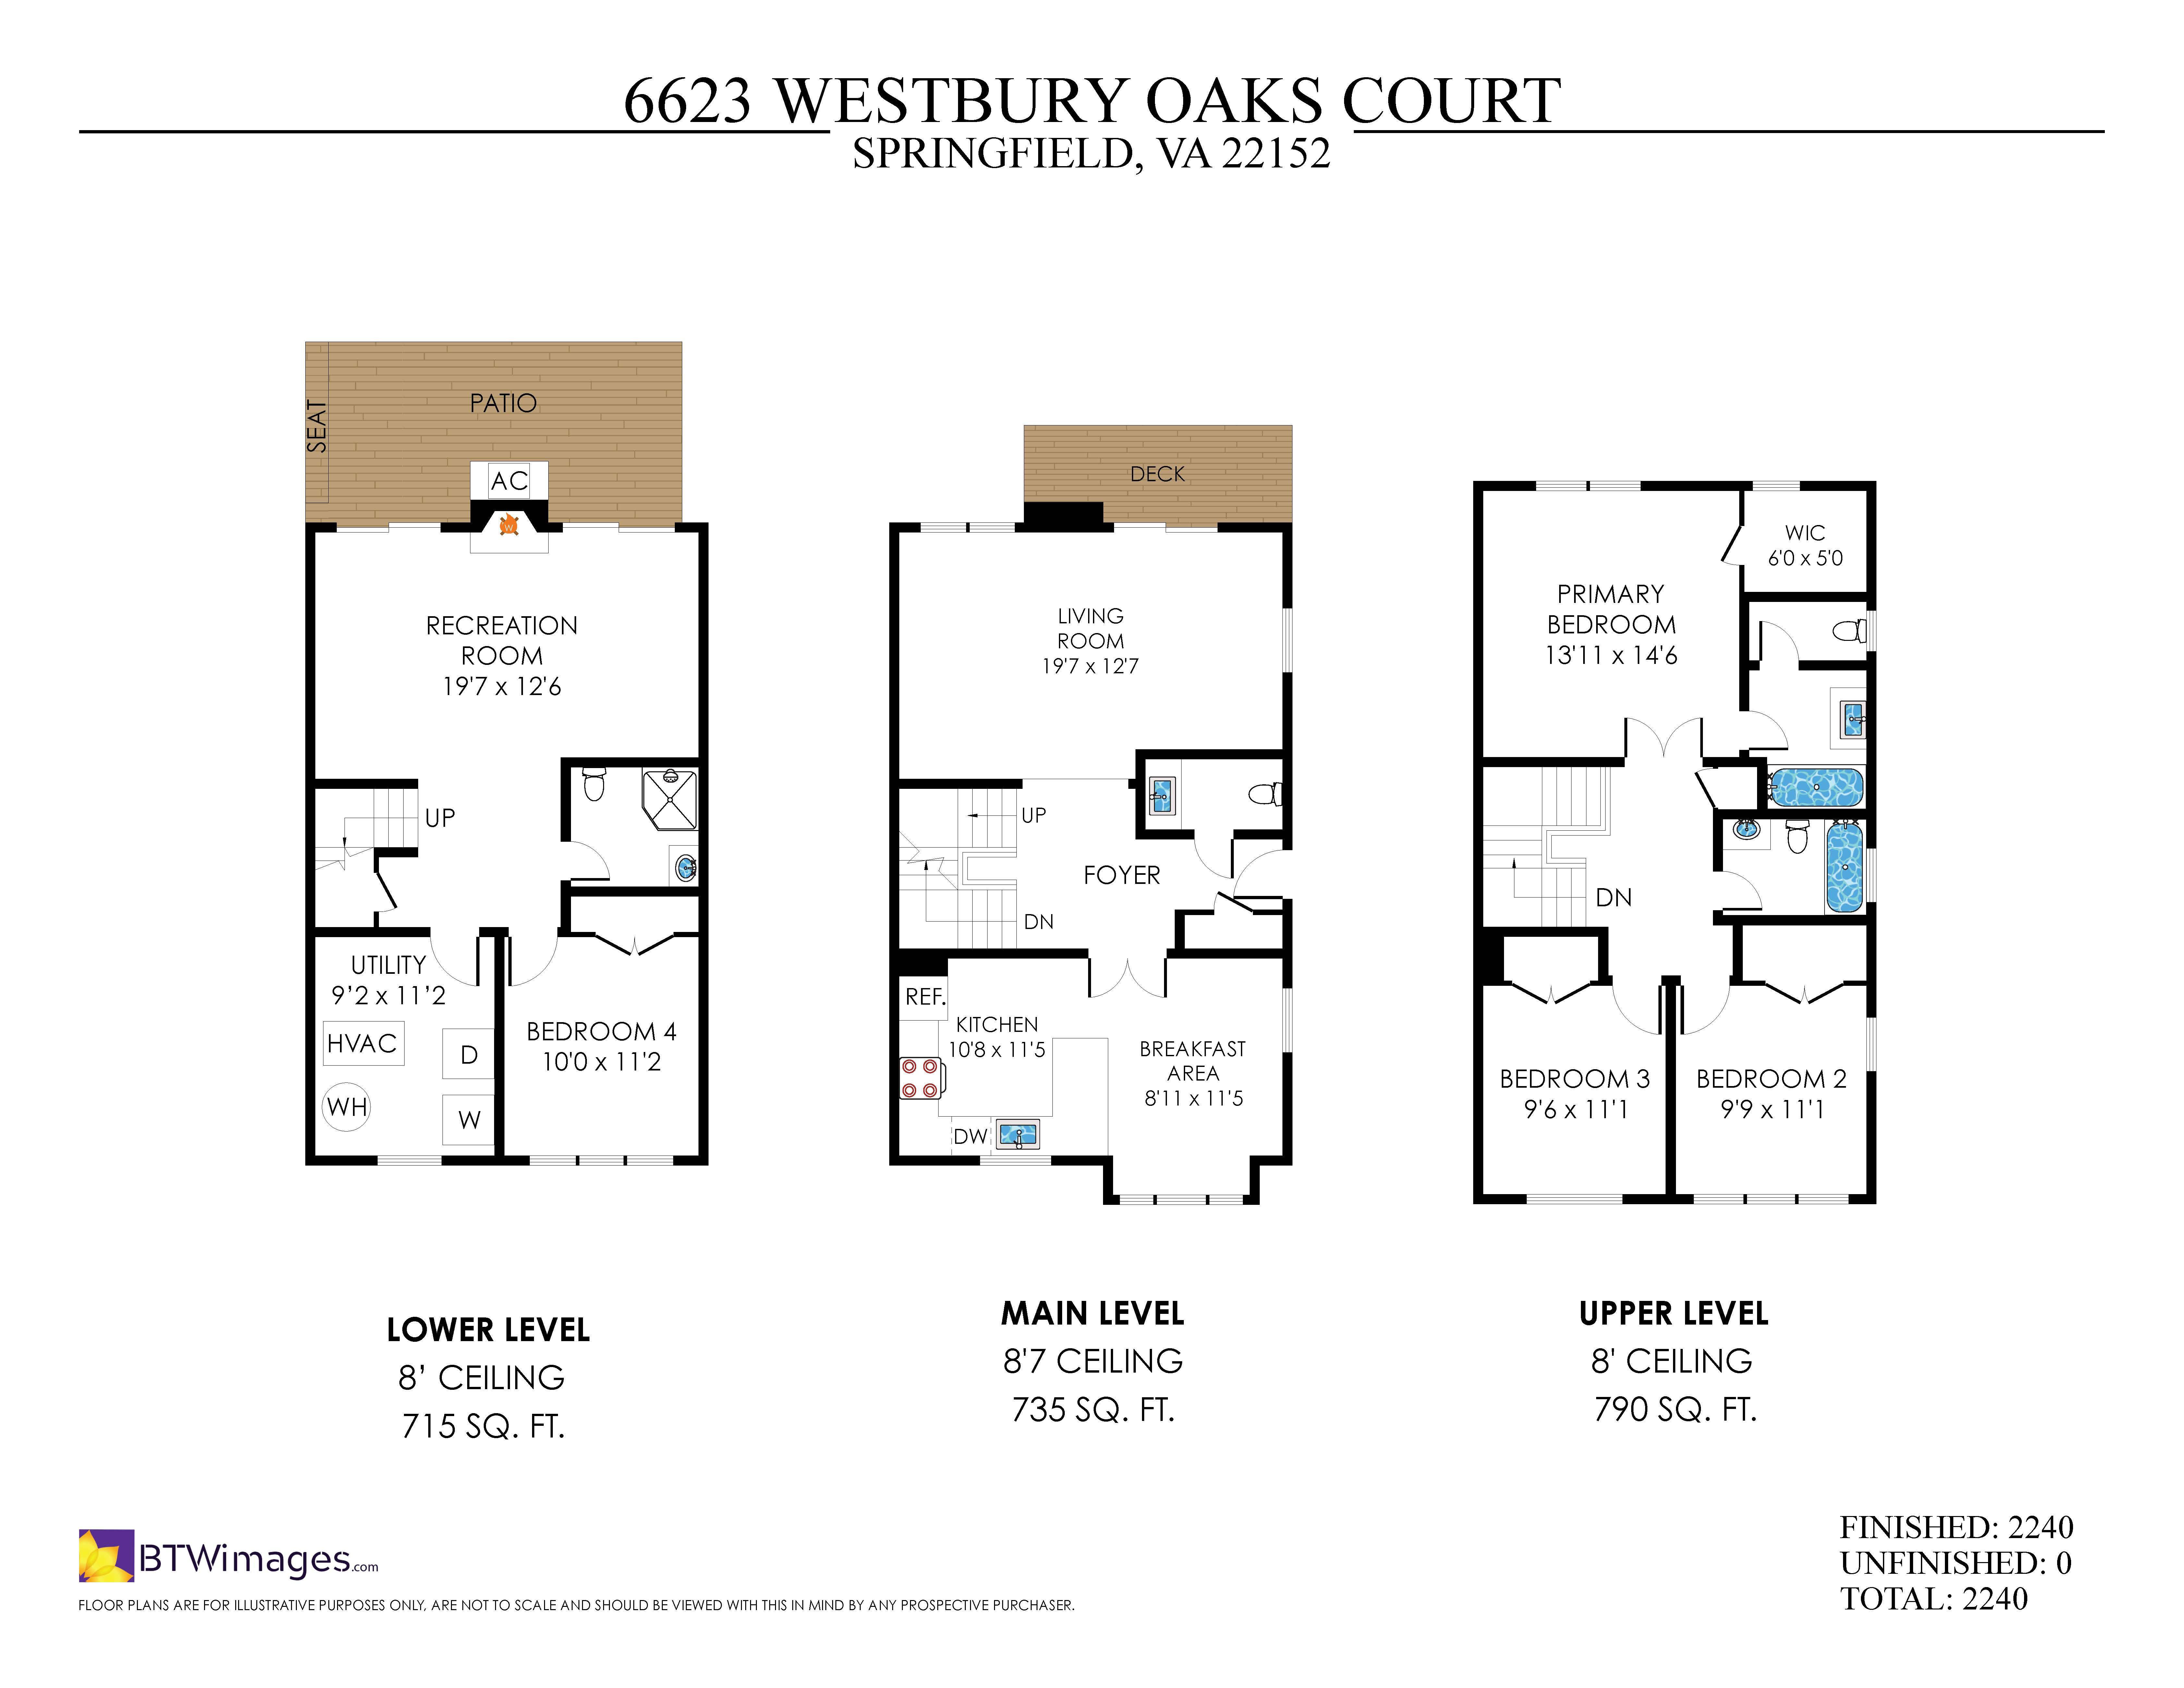 6623 Westbury Oaks Ct, Springfield- Floorplan